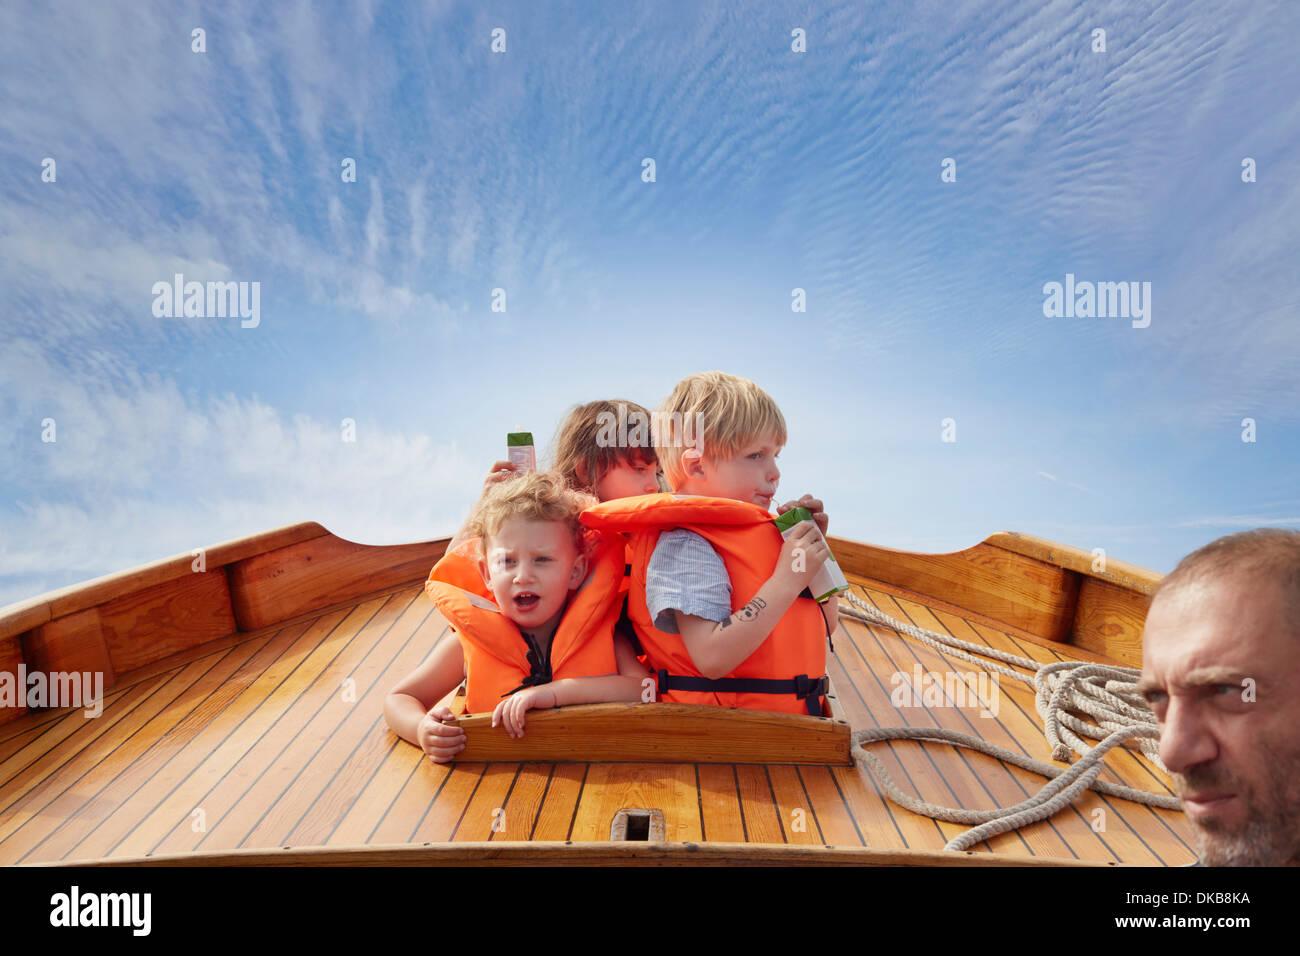 Children wearing life jackets on boat, Eggergrund, Sweden - Stock Image